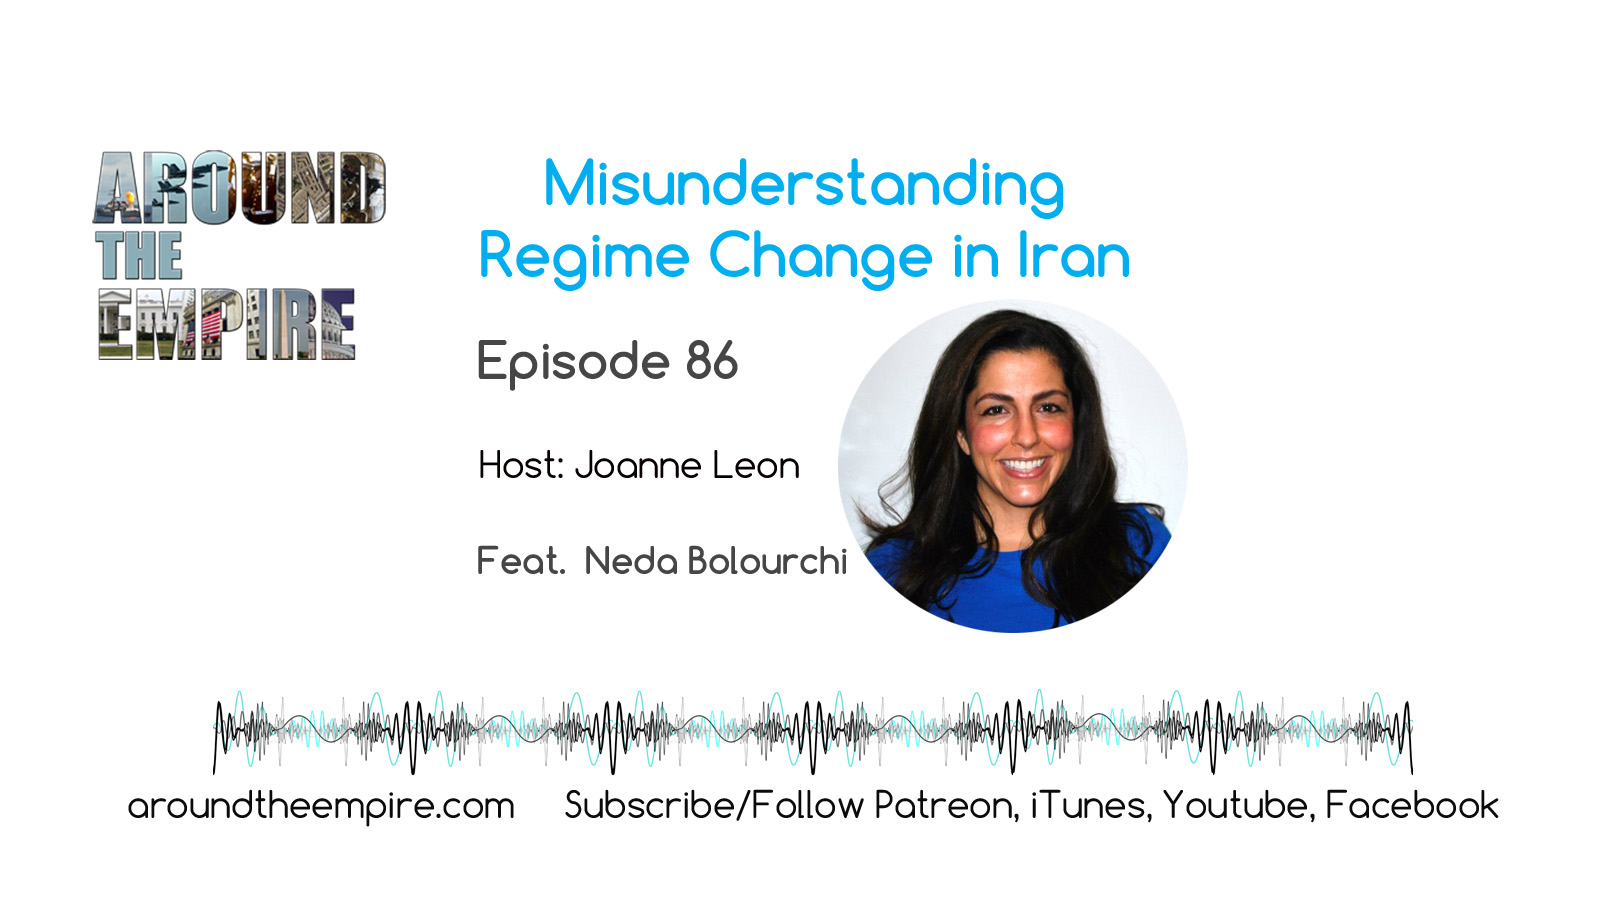 Ep86 Misunderstanding Iran Regime Change feat Neda Bolourchi